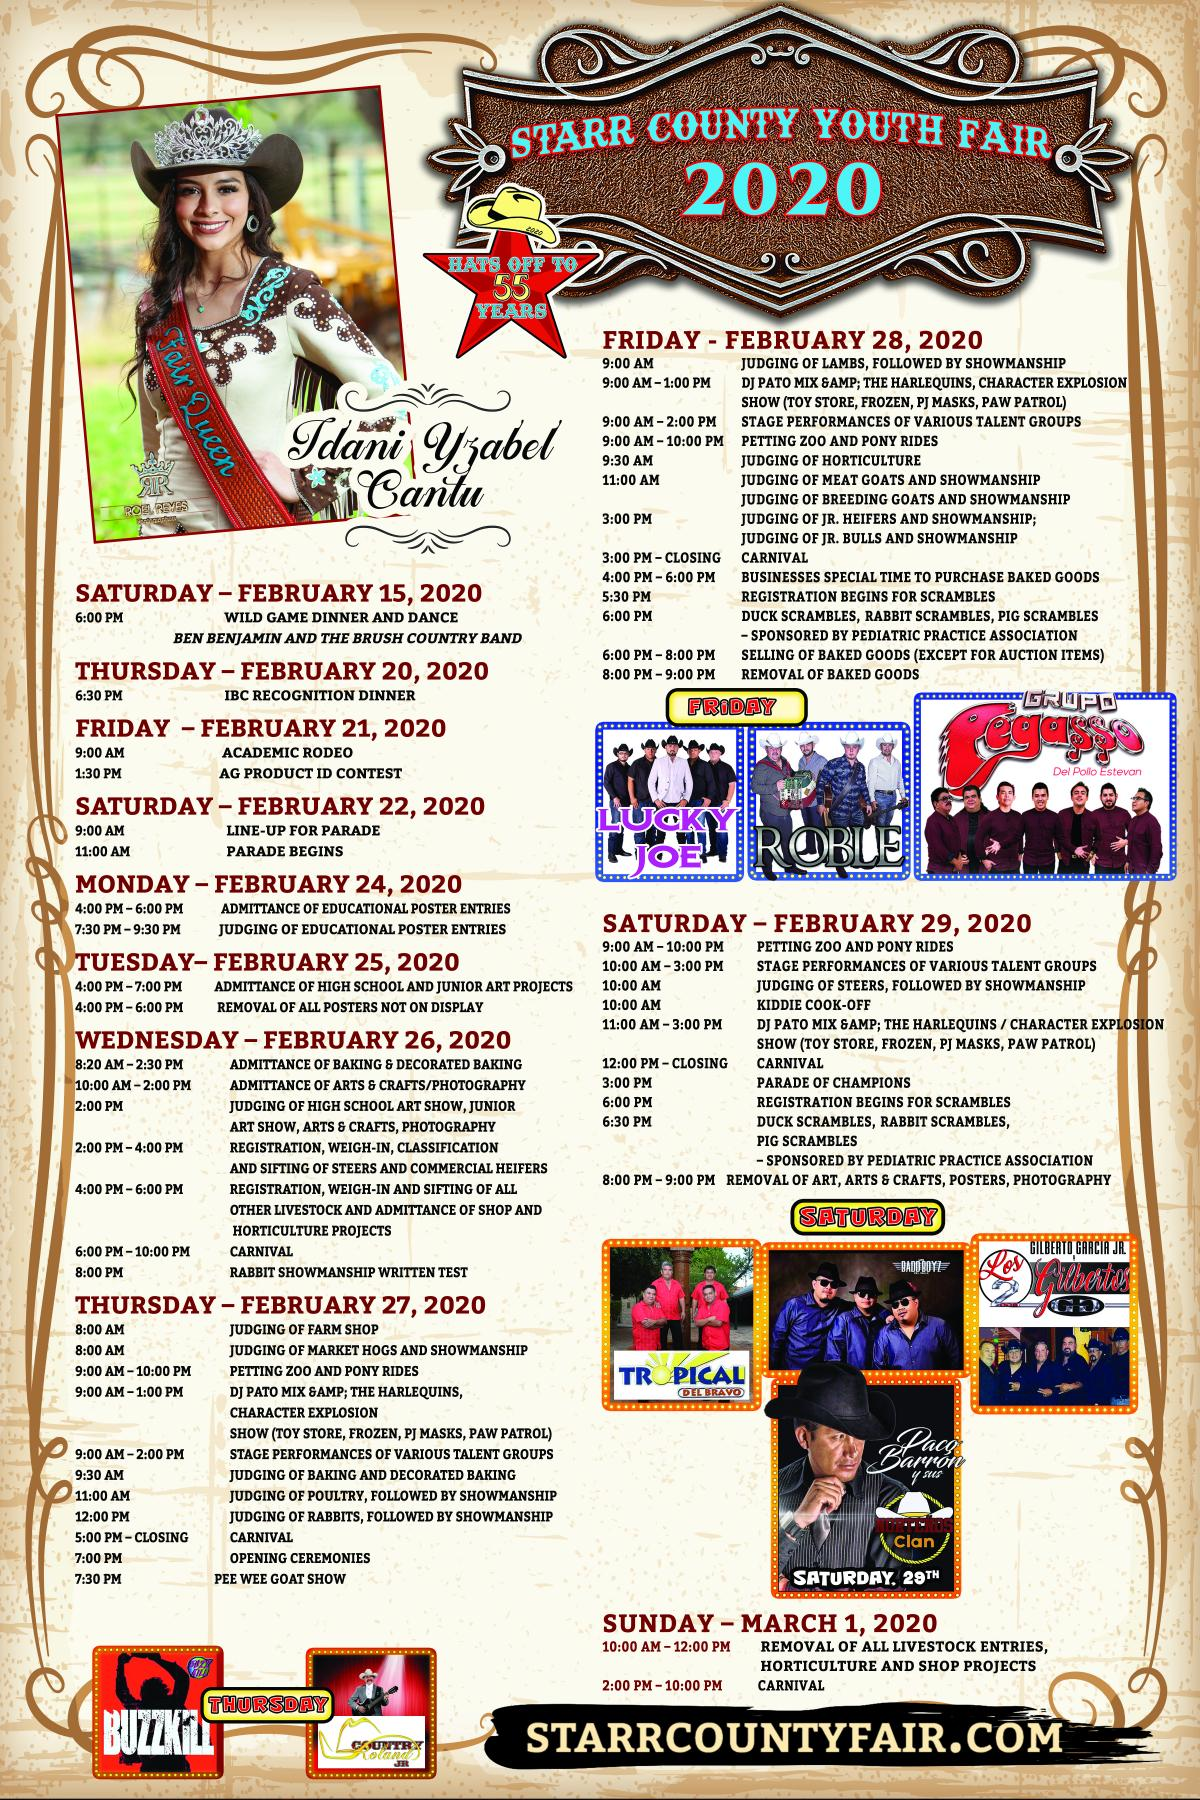 2-19-20 Schedule of Events